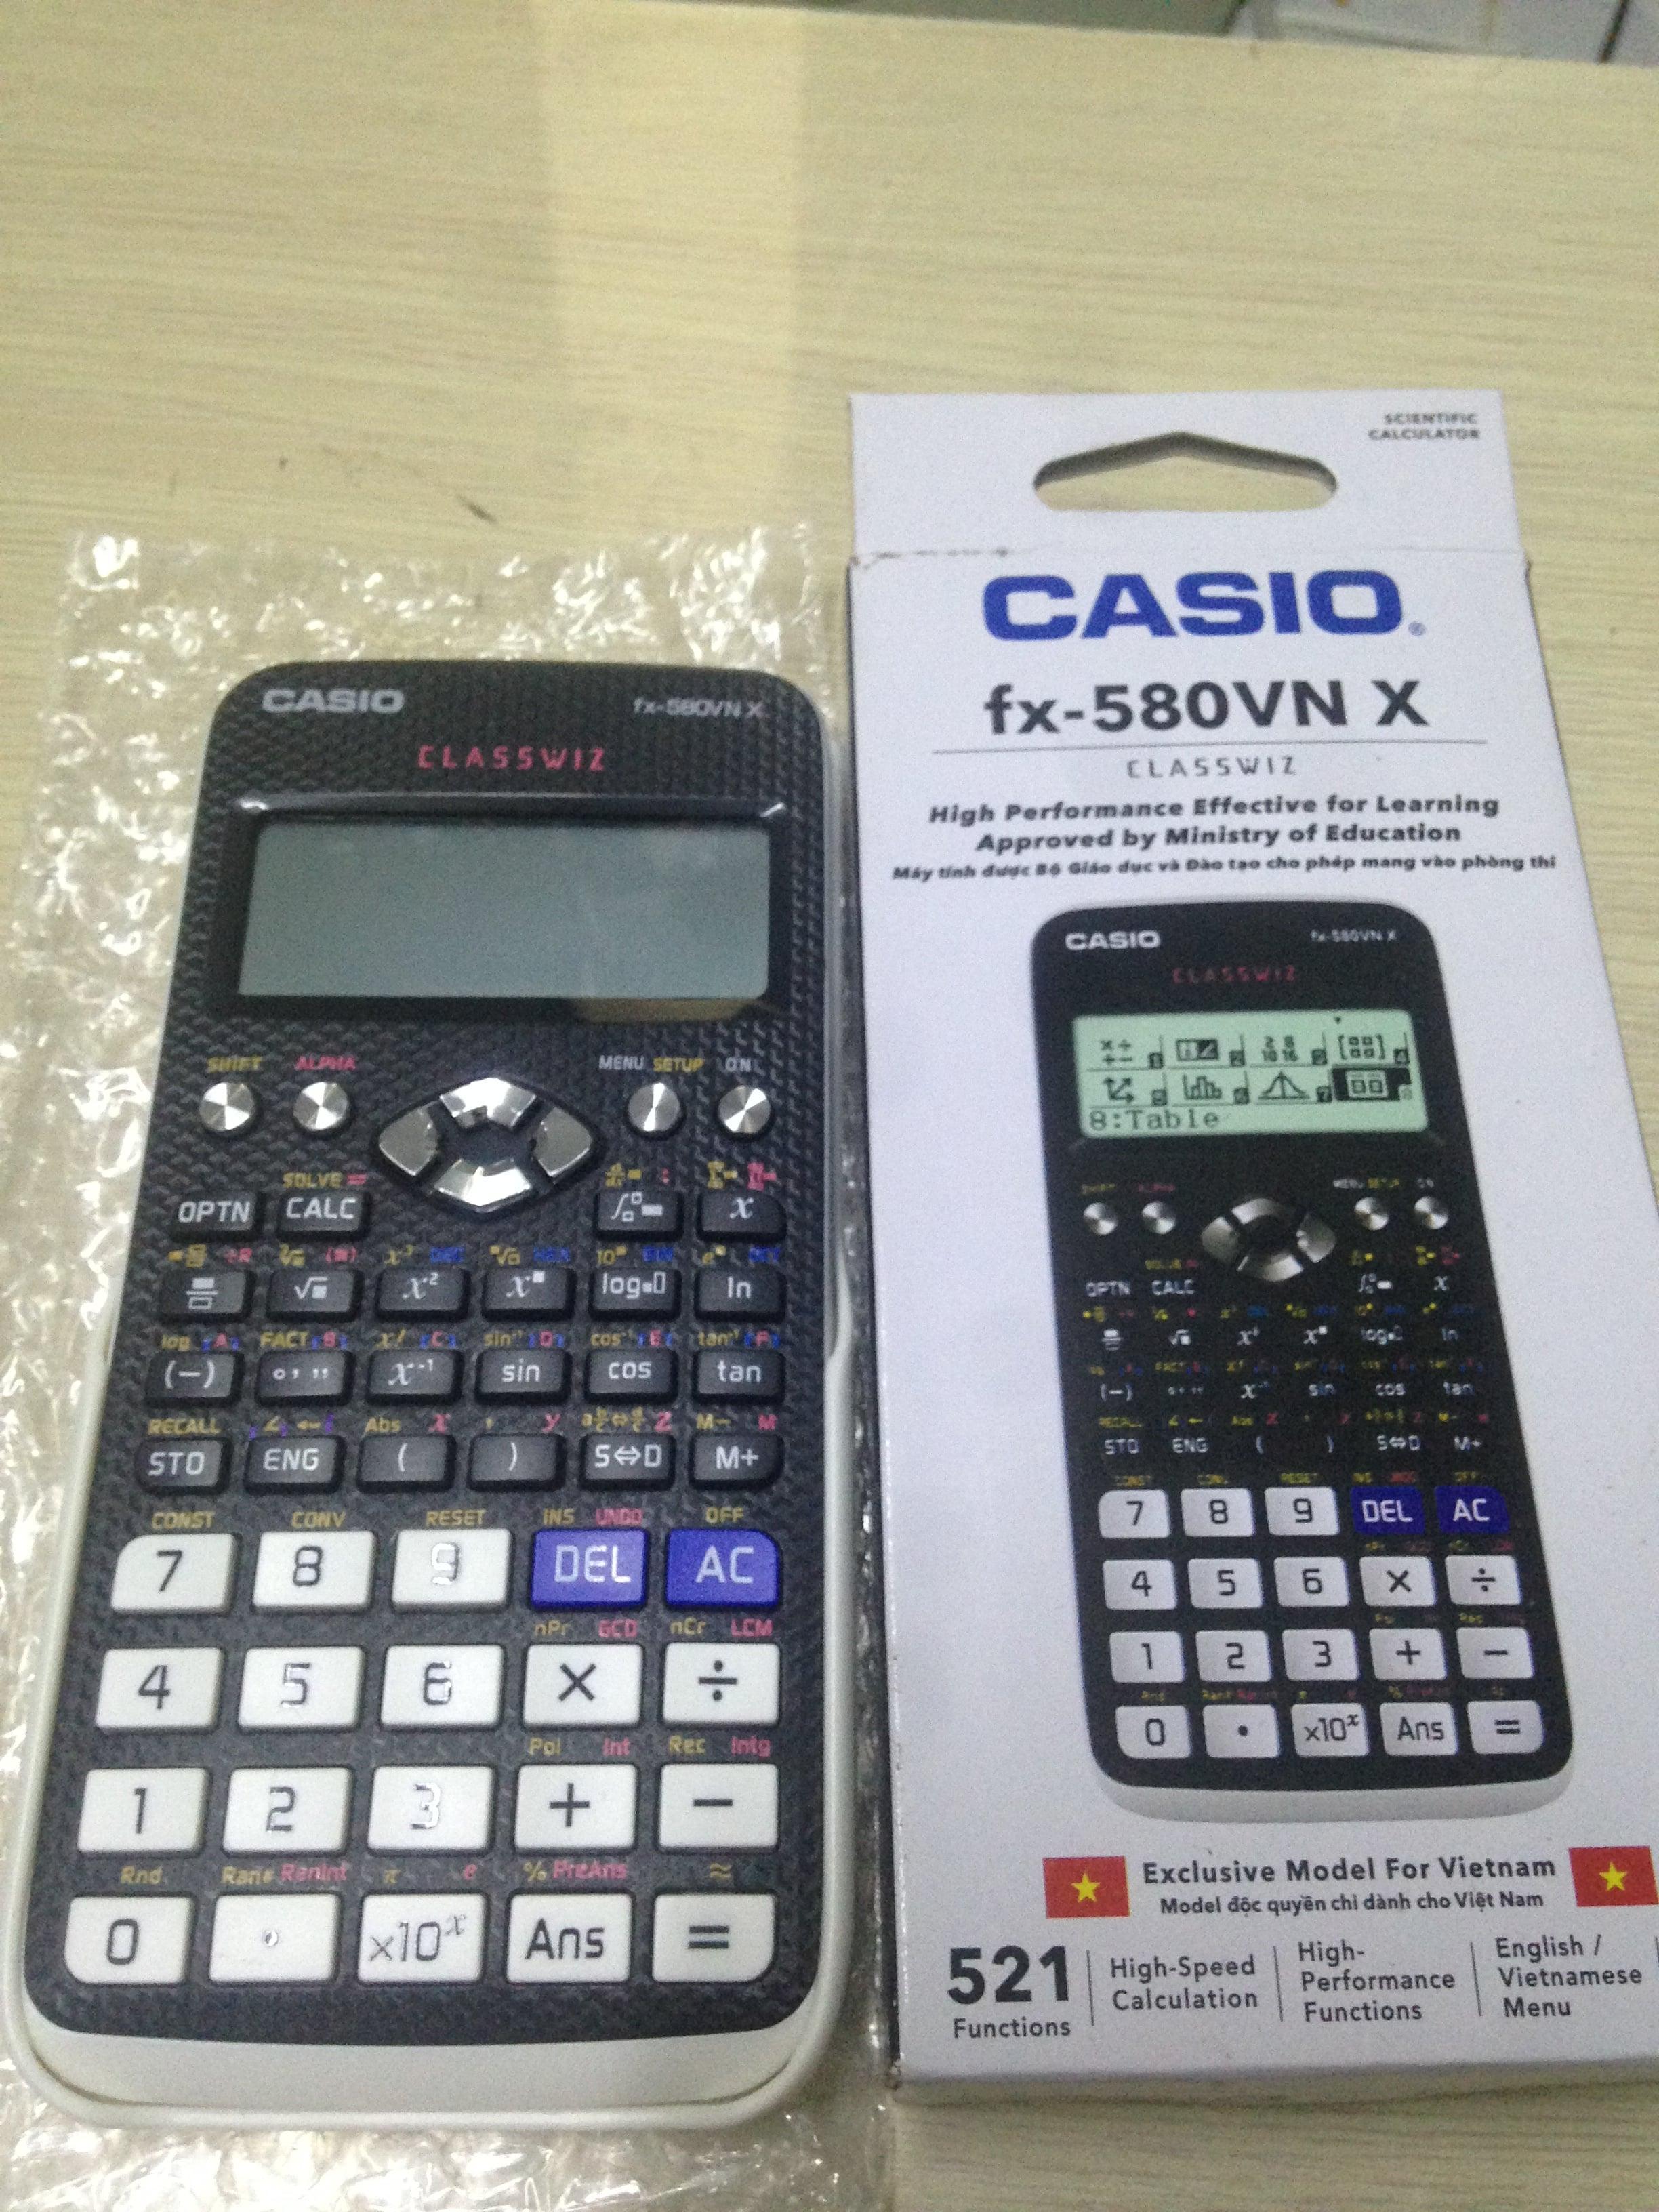 Mua [HANGTHAILAND] Máy tính CASIO FX 580VNX SIÊU GIẢM GIÁ